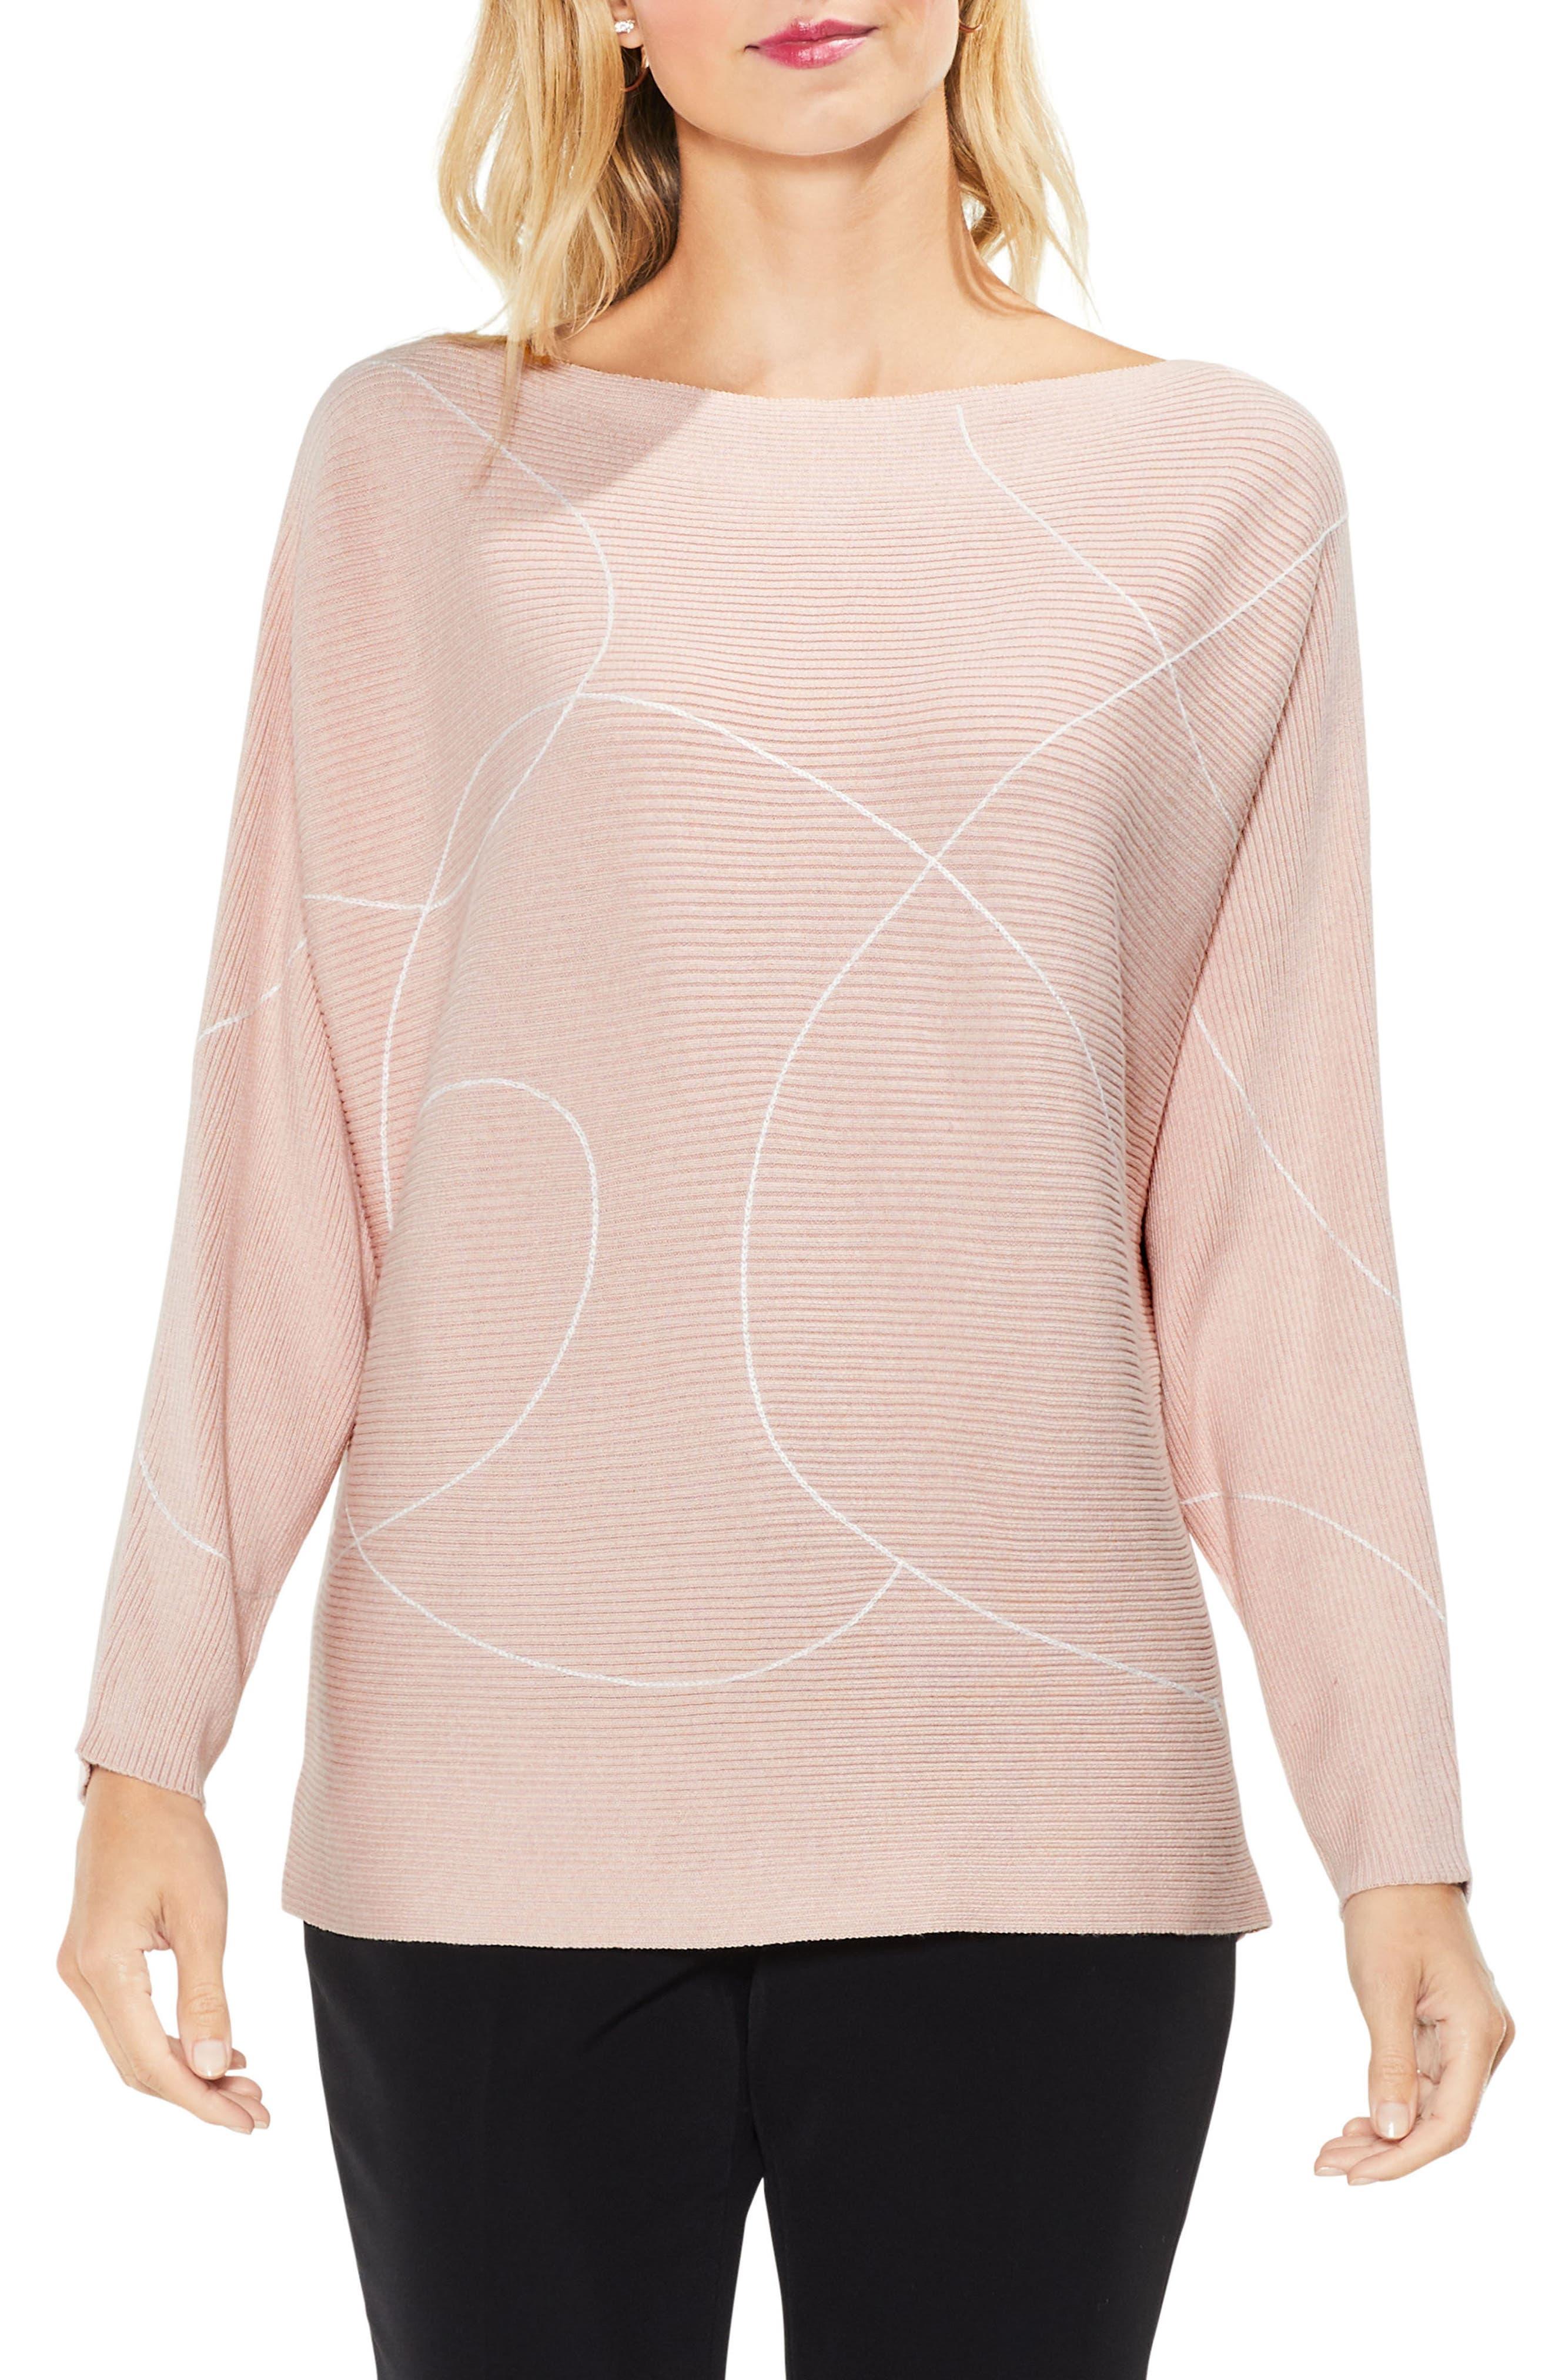 Main Image - Vince Camuto Ink Swirl Ribbed Sweater (Regular & Petite)